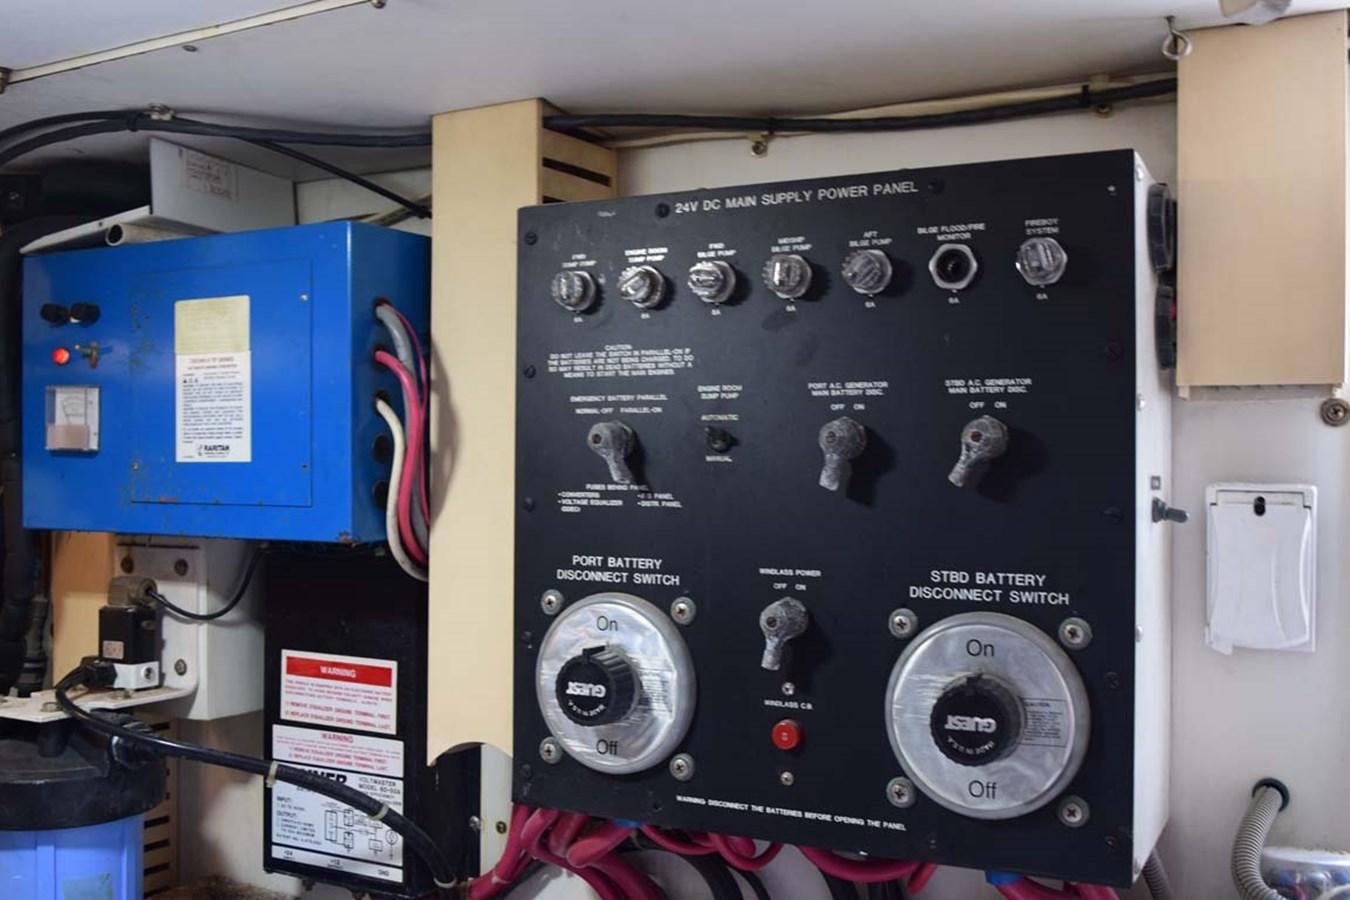 DC Power Panel 1998 BERTRAM 60 Convertible Sport Fisherman 2700108